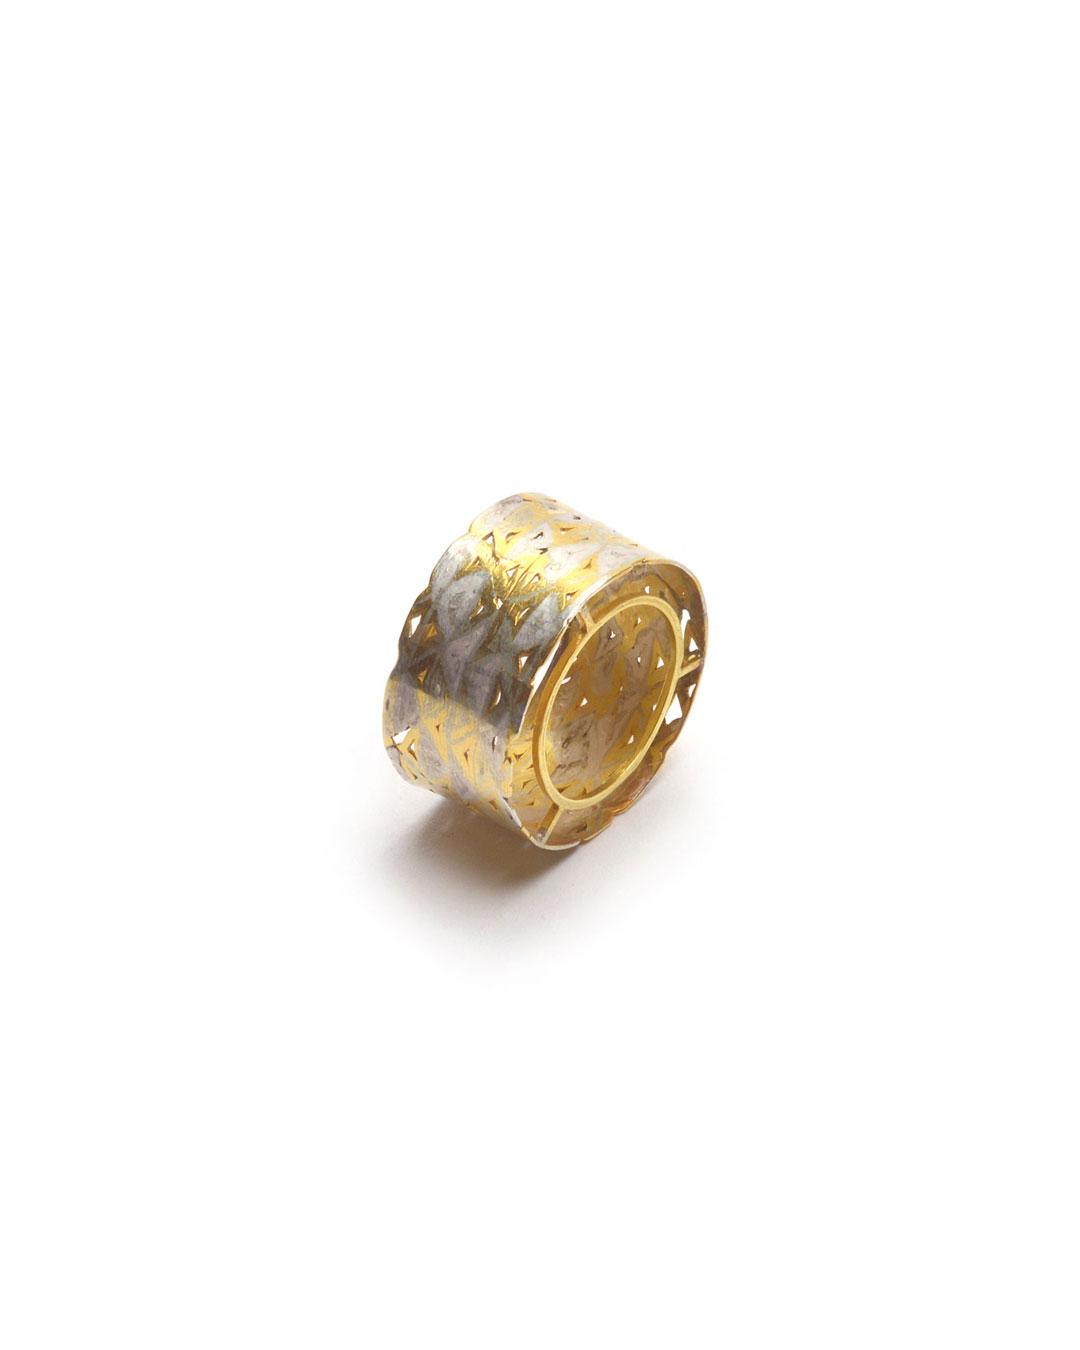 Stefano Marchetti, untitled, 2015, ring; gold, silver, 28 x 28 x 15 mm, €4000